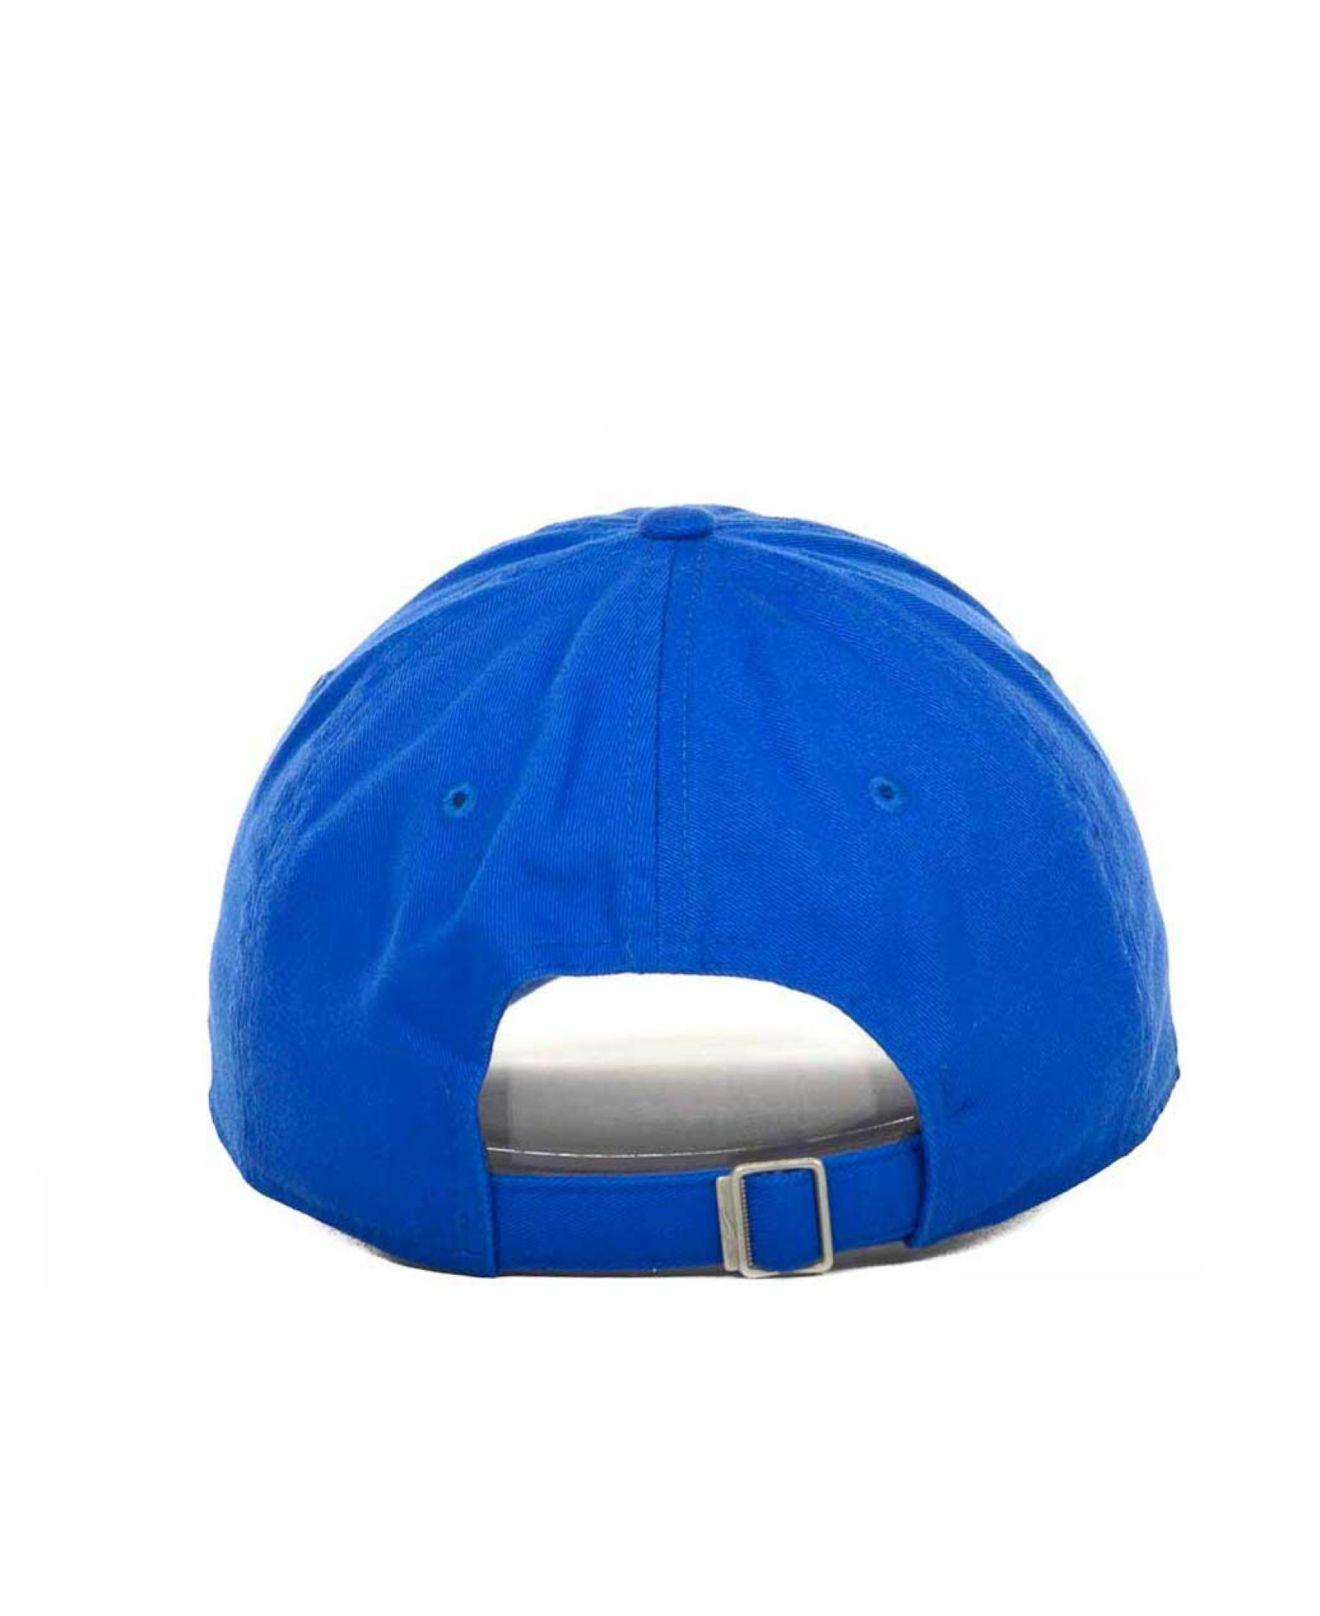 87d4d014384 Lyst - Nike Florida Gators Heritage 86 Campus Cap in Blue for Men